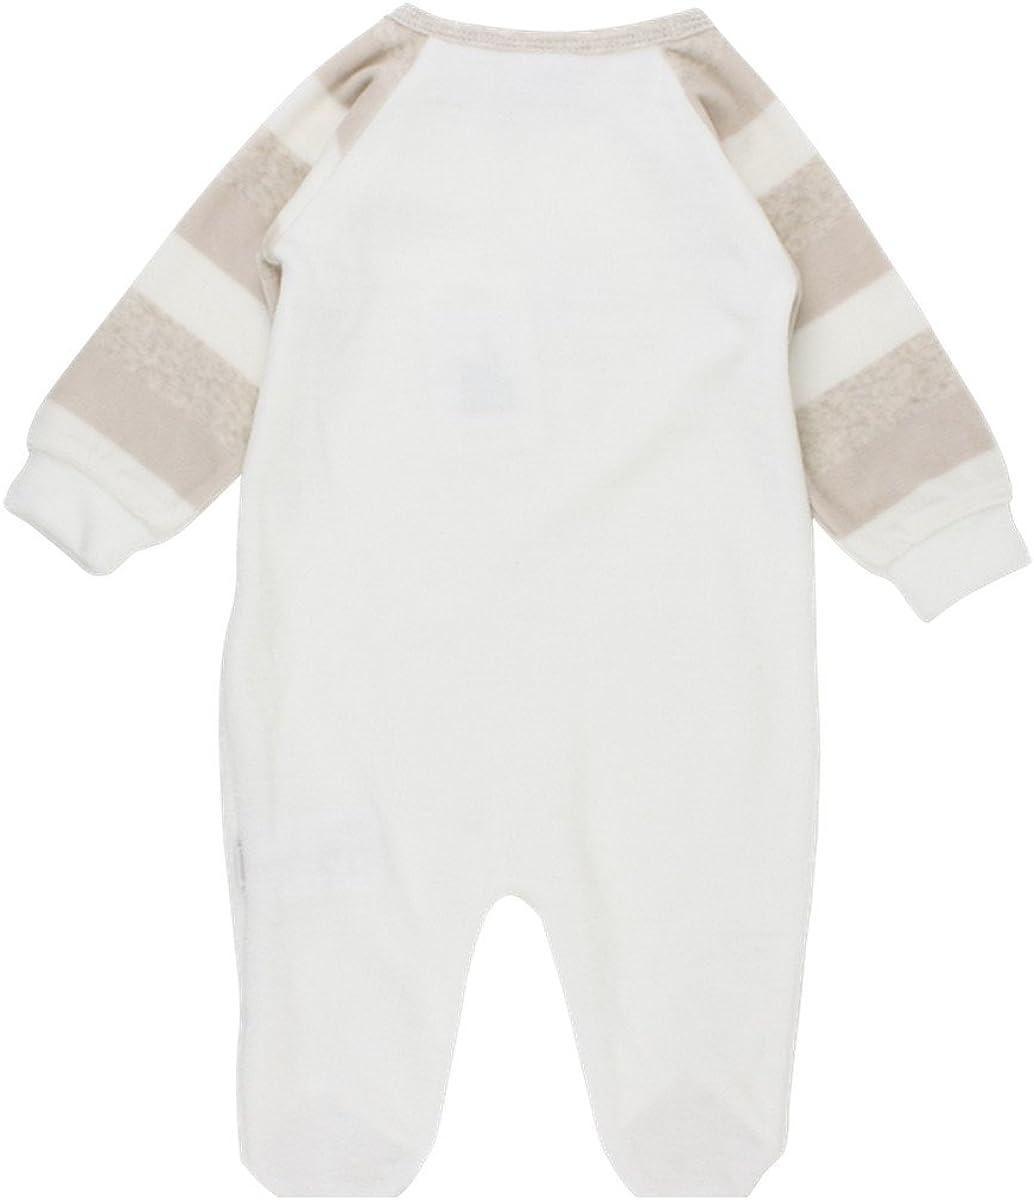 Fixoni Baby Strampler neutral wei/ß//beige